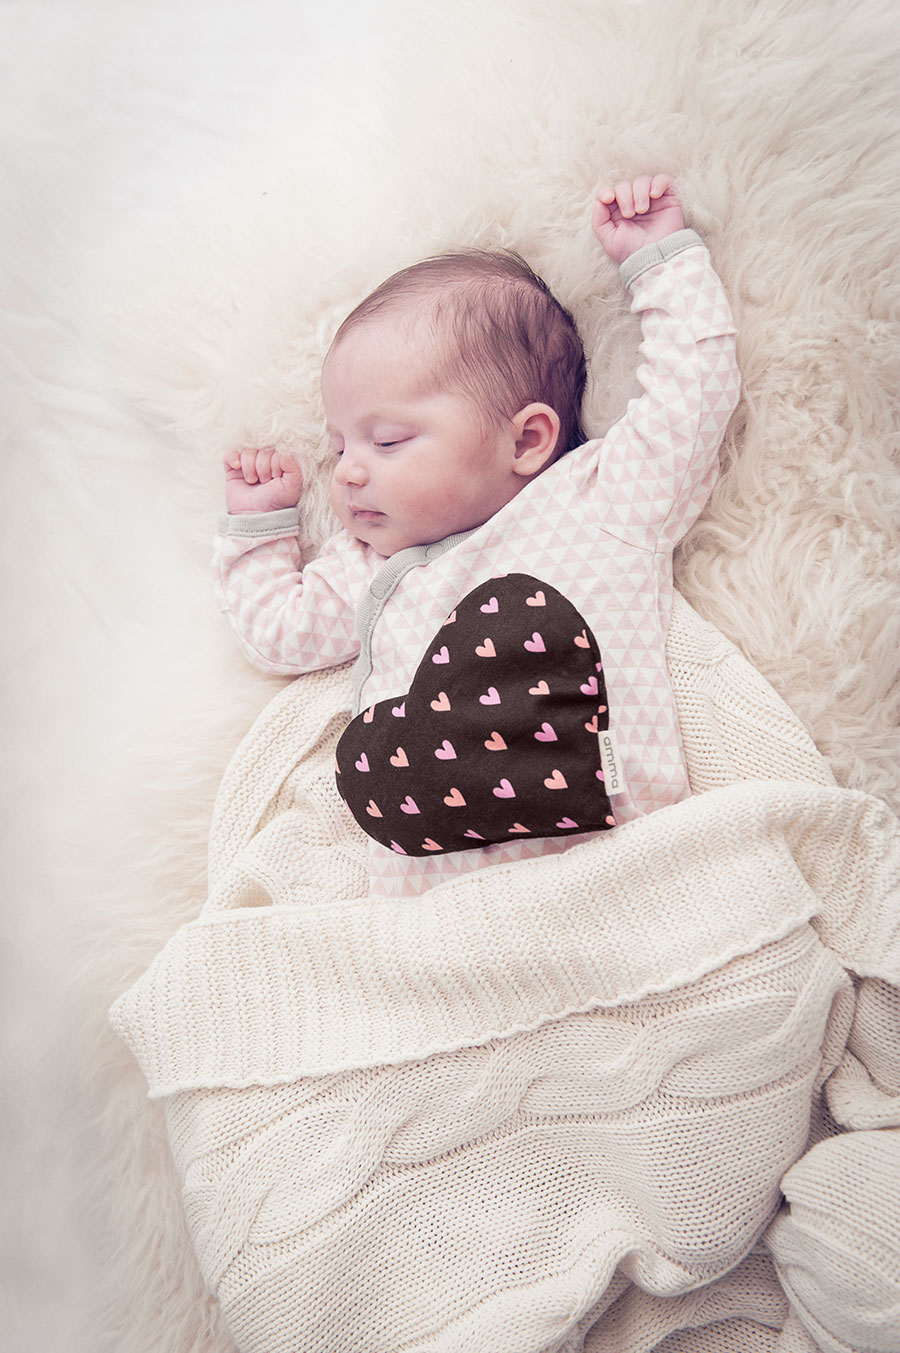 Heart Comfort Cushion For Babies